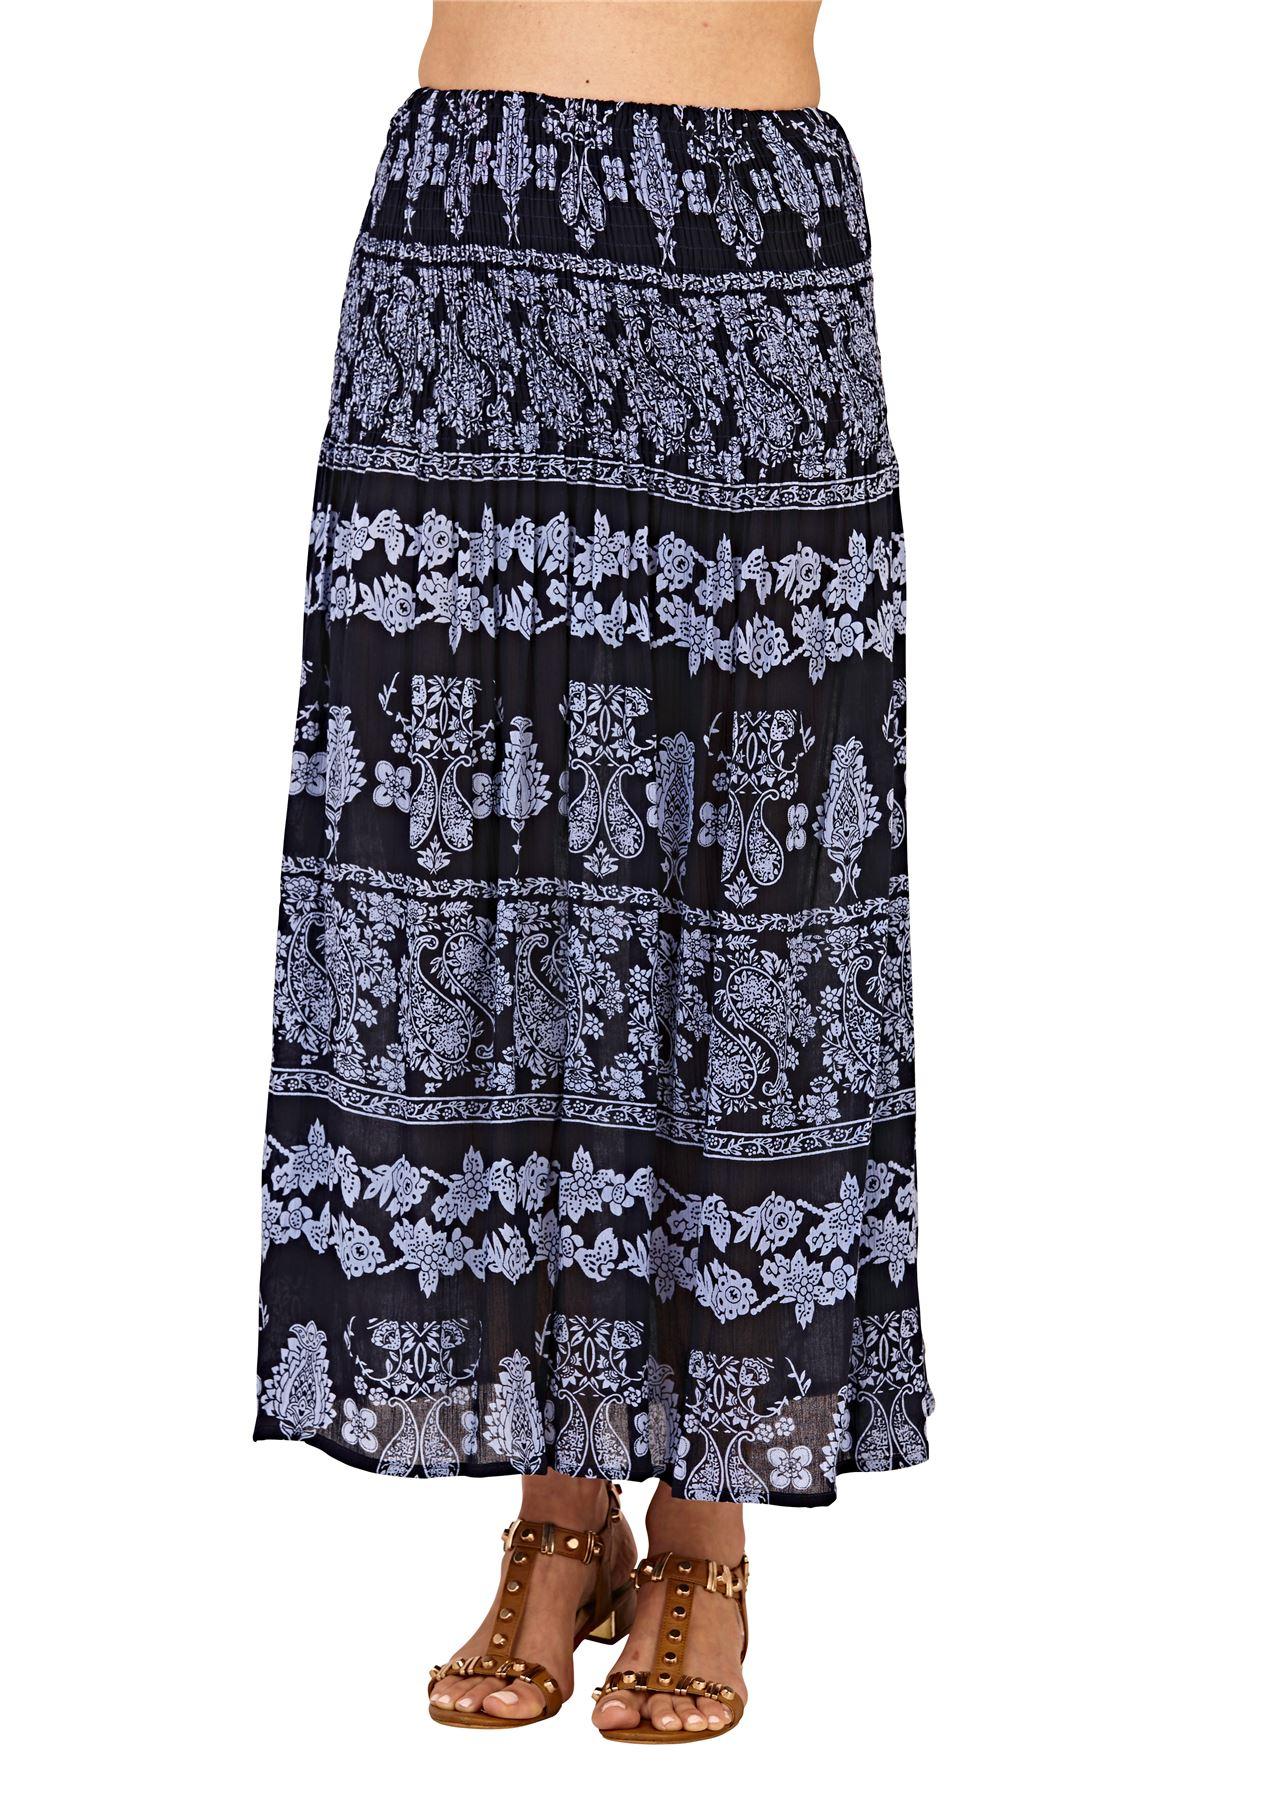 Ladies-Pistachio-Viscose-3-Way-Halter-Bandeau-Skirt-Summer-Beach-Dresses thumbnail 8